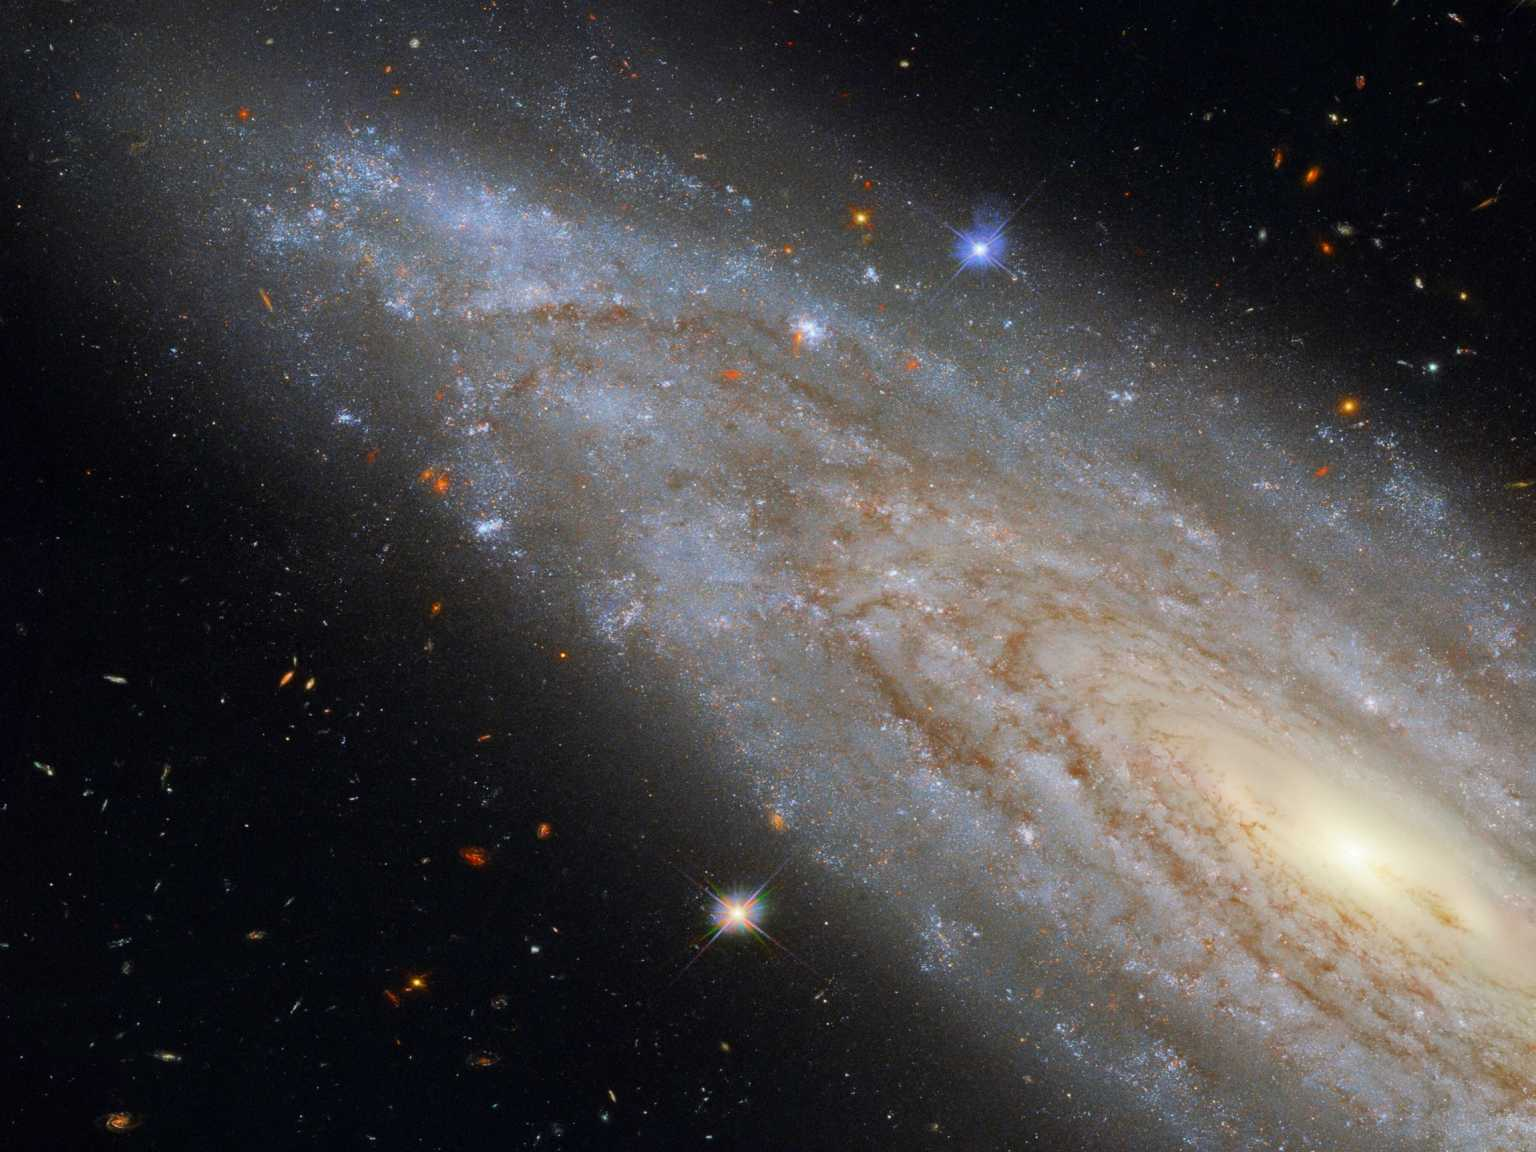 NASA: Ασύλληπτη φωτογραφία του Hubble – Ένας ολόκληρος γαλαξίας στο «πιάτο»